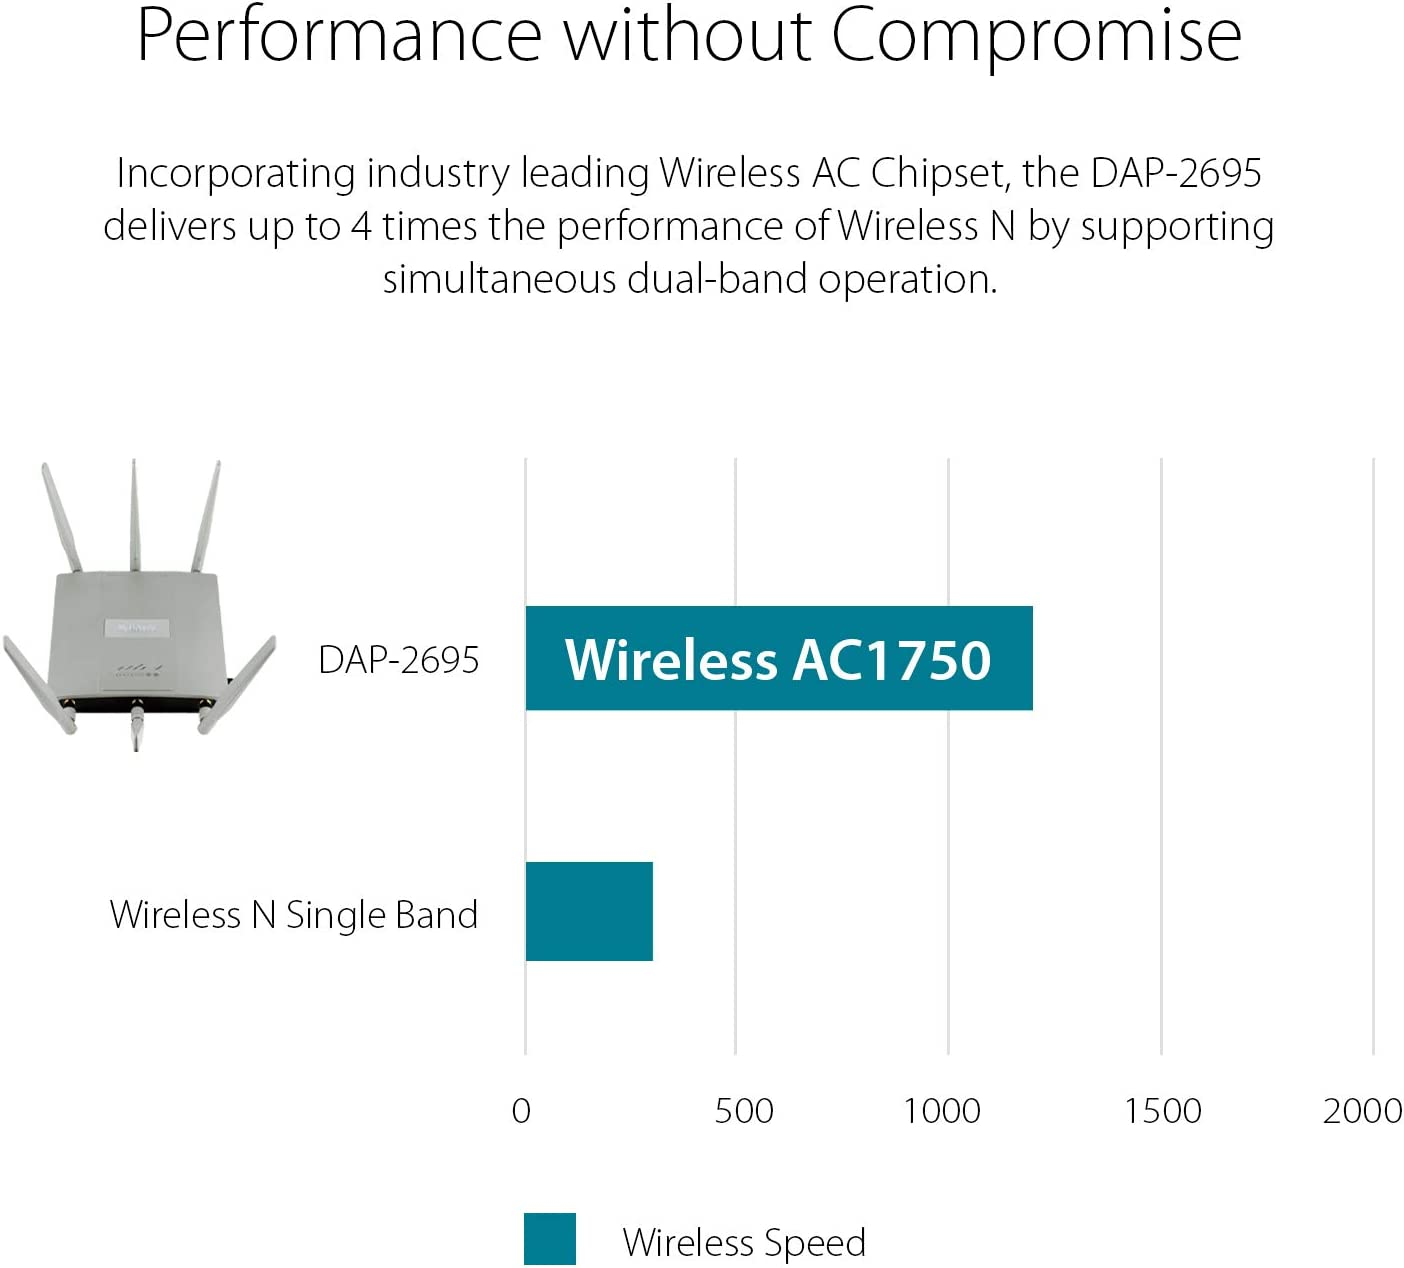 D-Link DAP-2695 Wireless AC1750 Simultaneous Dual-Band PoE Access Point